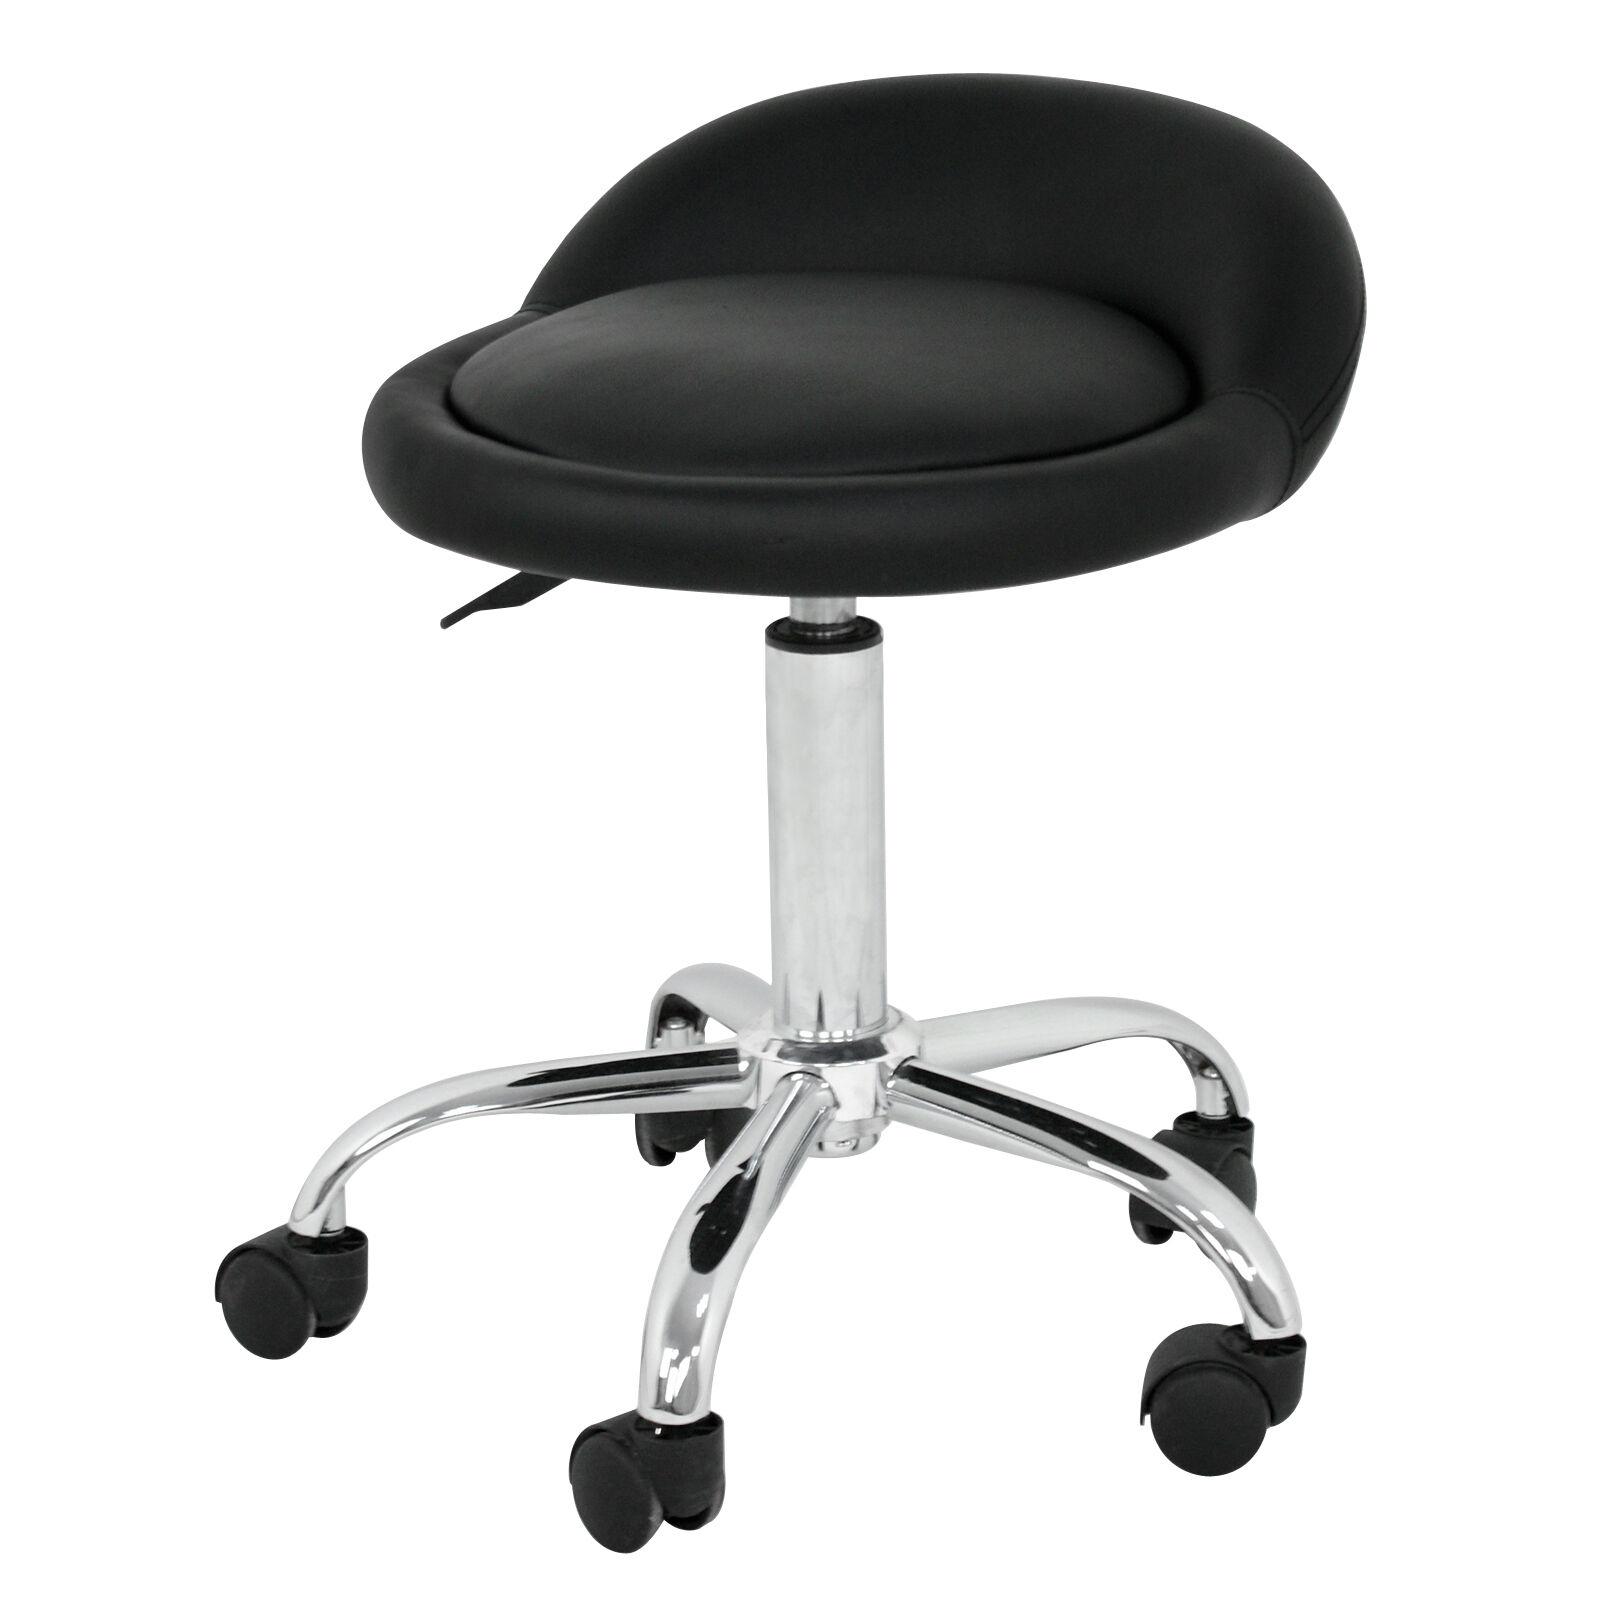 Adjustable Salon Stool Hydraulic Saddle Rolling Chair Tattoo Facial Massage Spa Health & Beauty